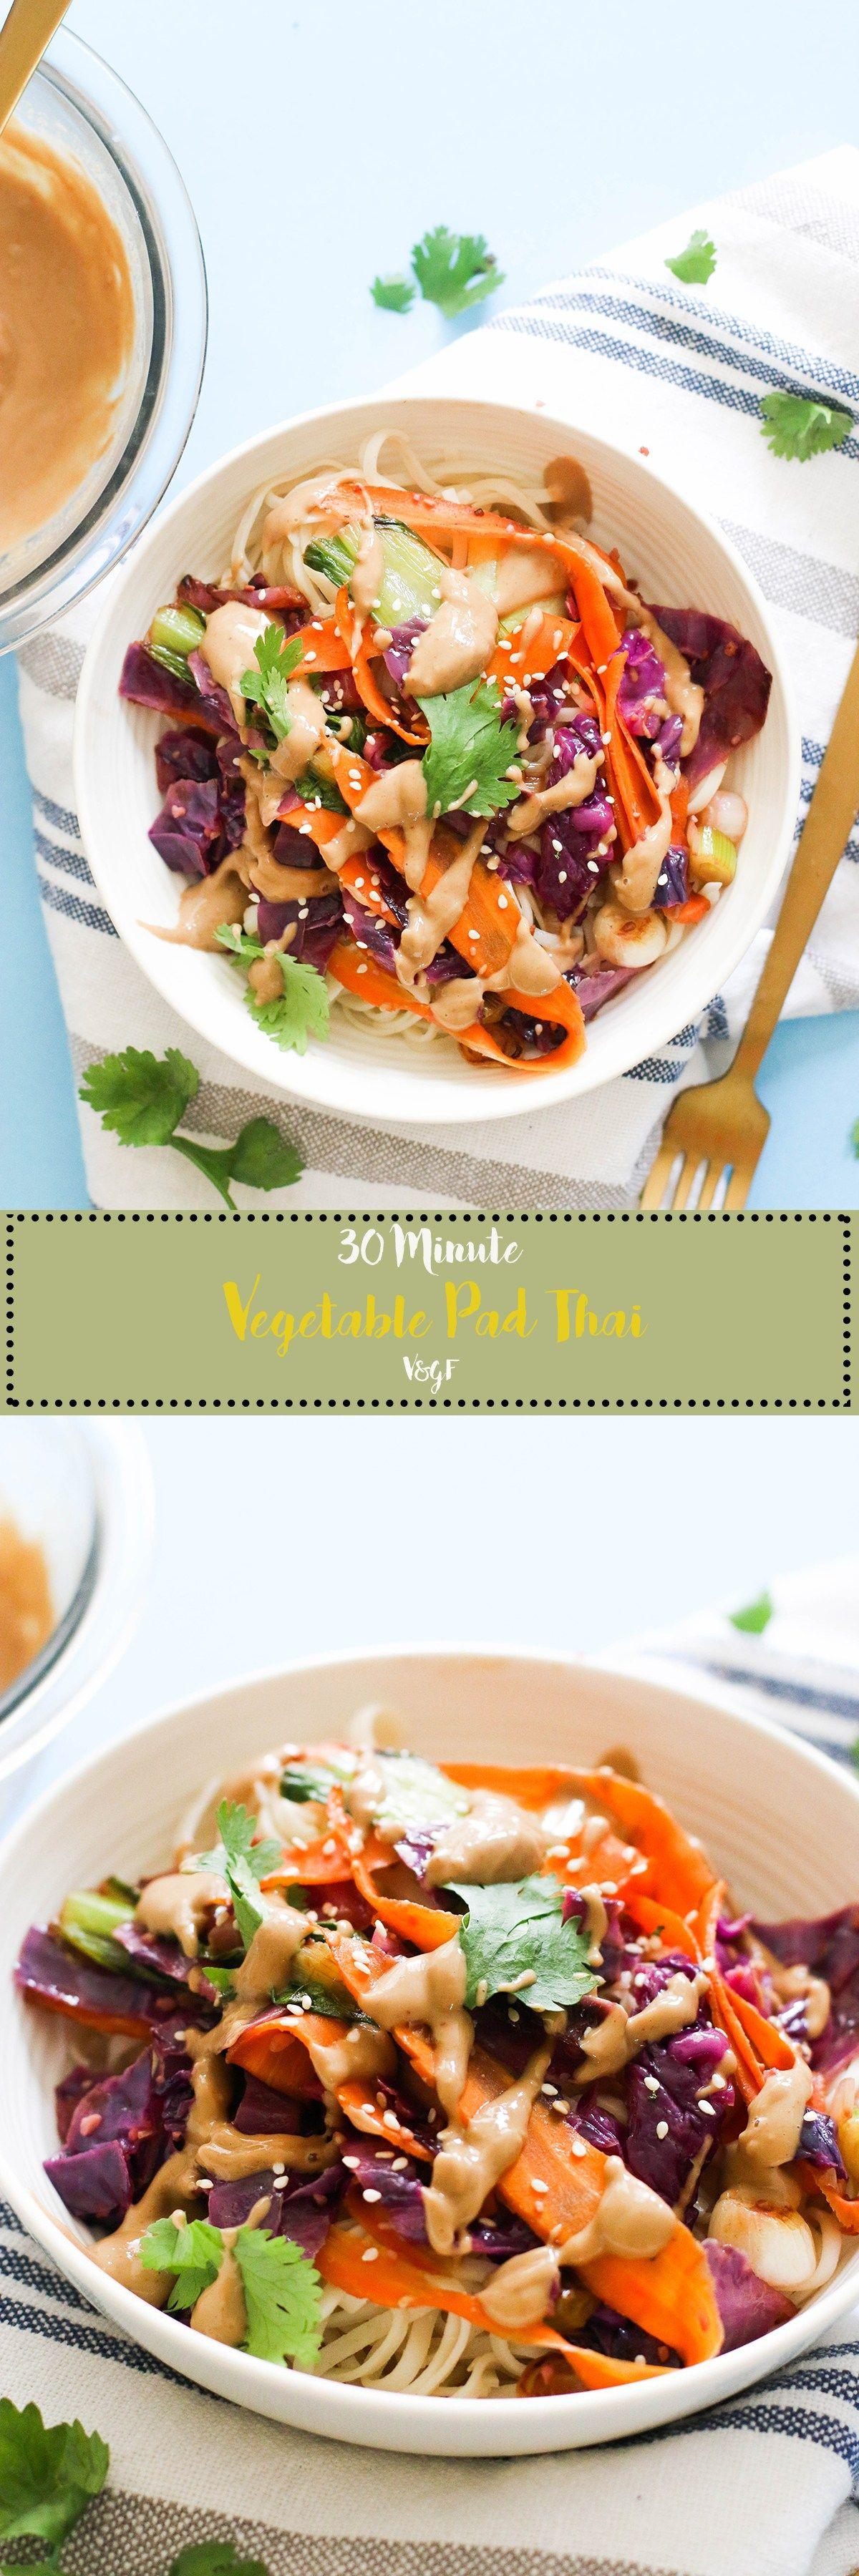 thai food menu veg